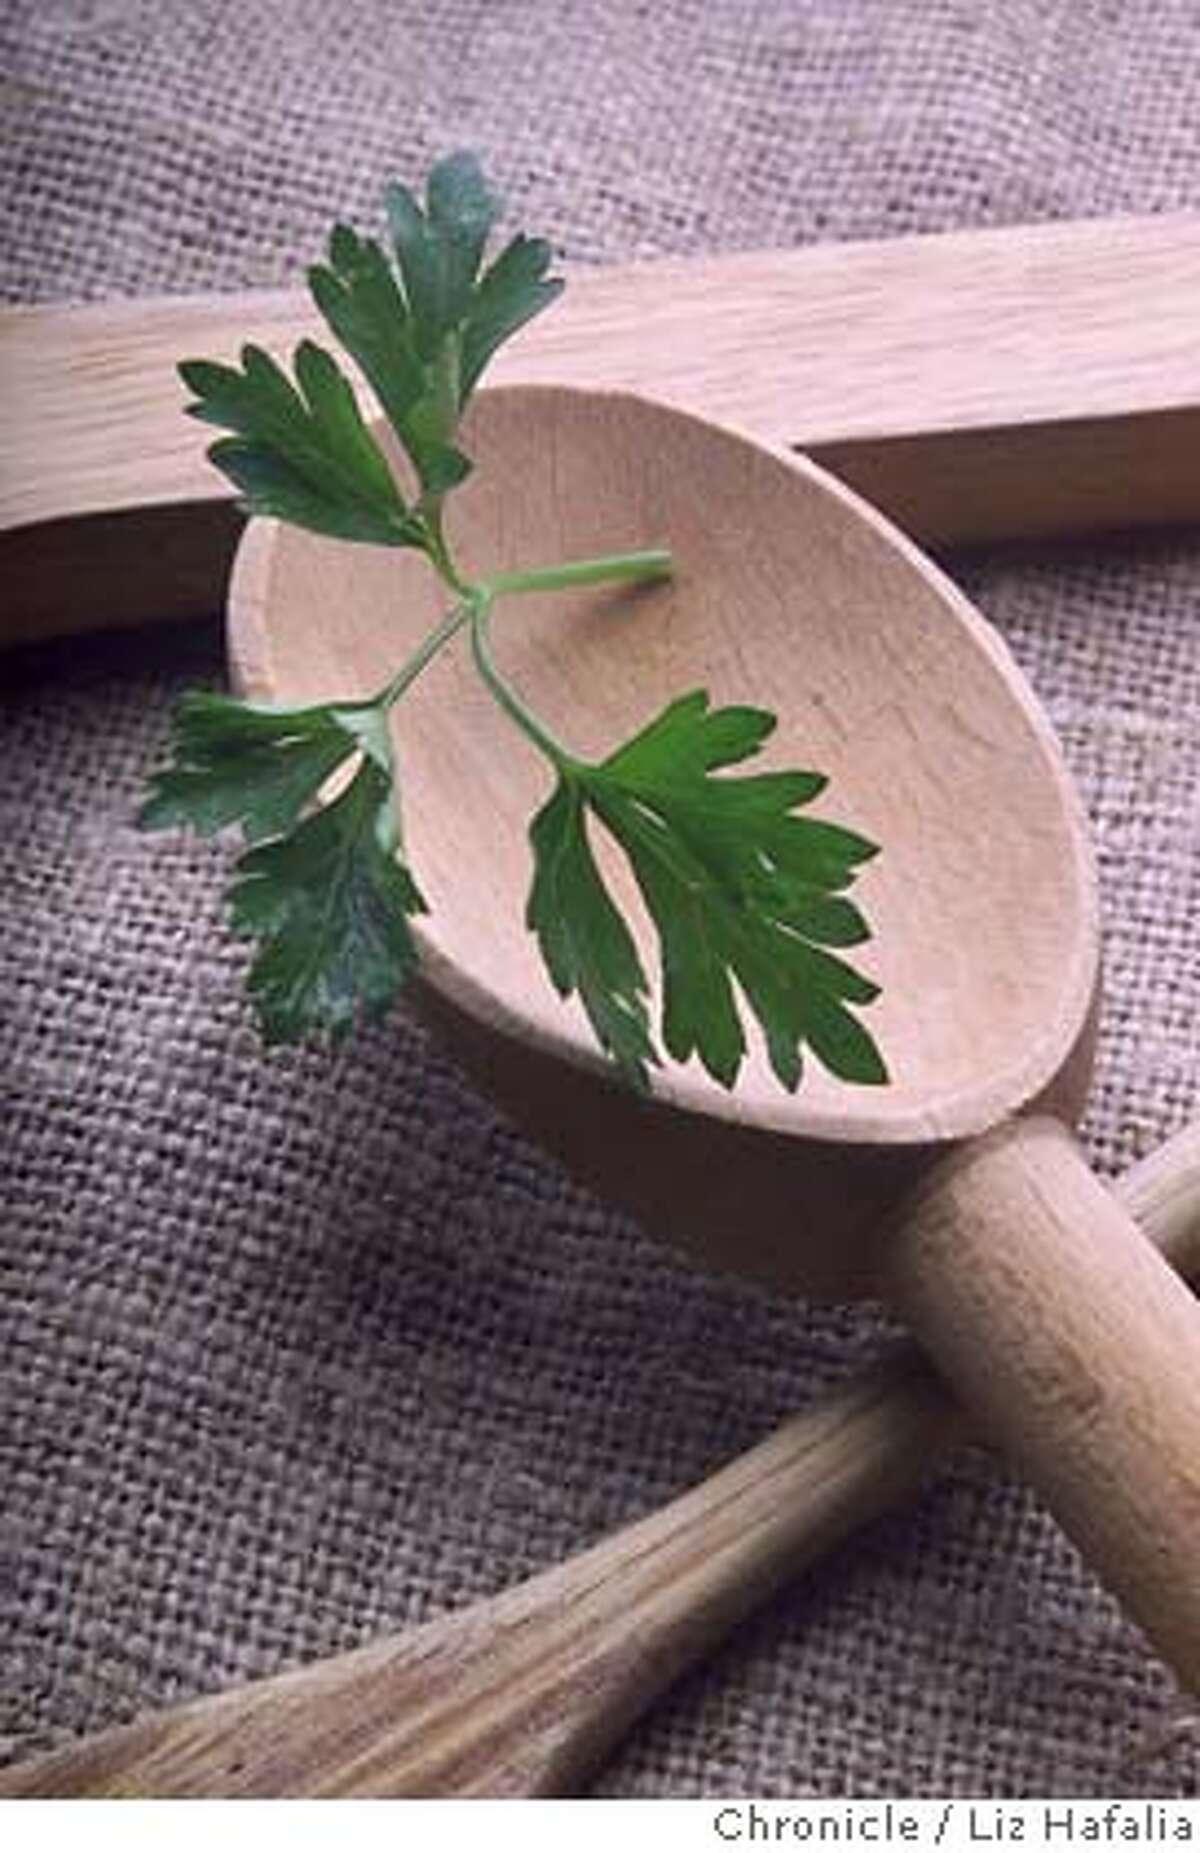 ###Live Caption:italian parsley###Caption History:FOODHERBS-C-24JUL00-FD-LH--Italian parsley. Photo by Liz Hafalia/STYLED BY NOEL ADVINCULA###Notes:###Special Instructions:cat